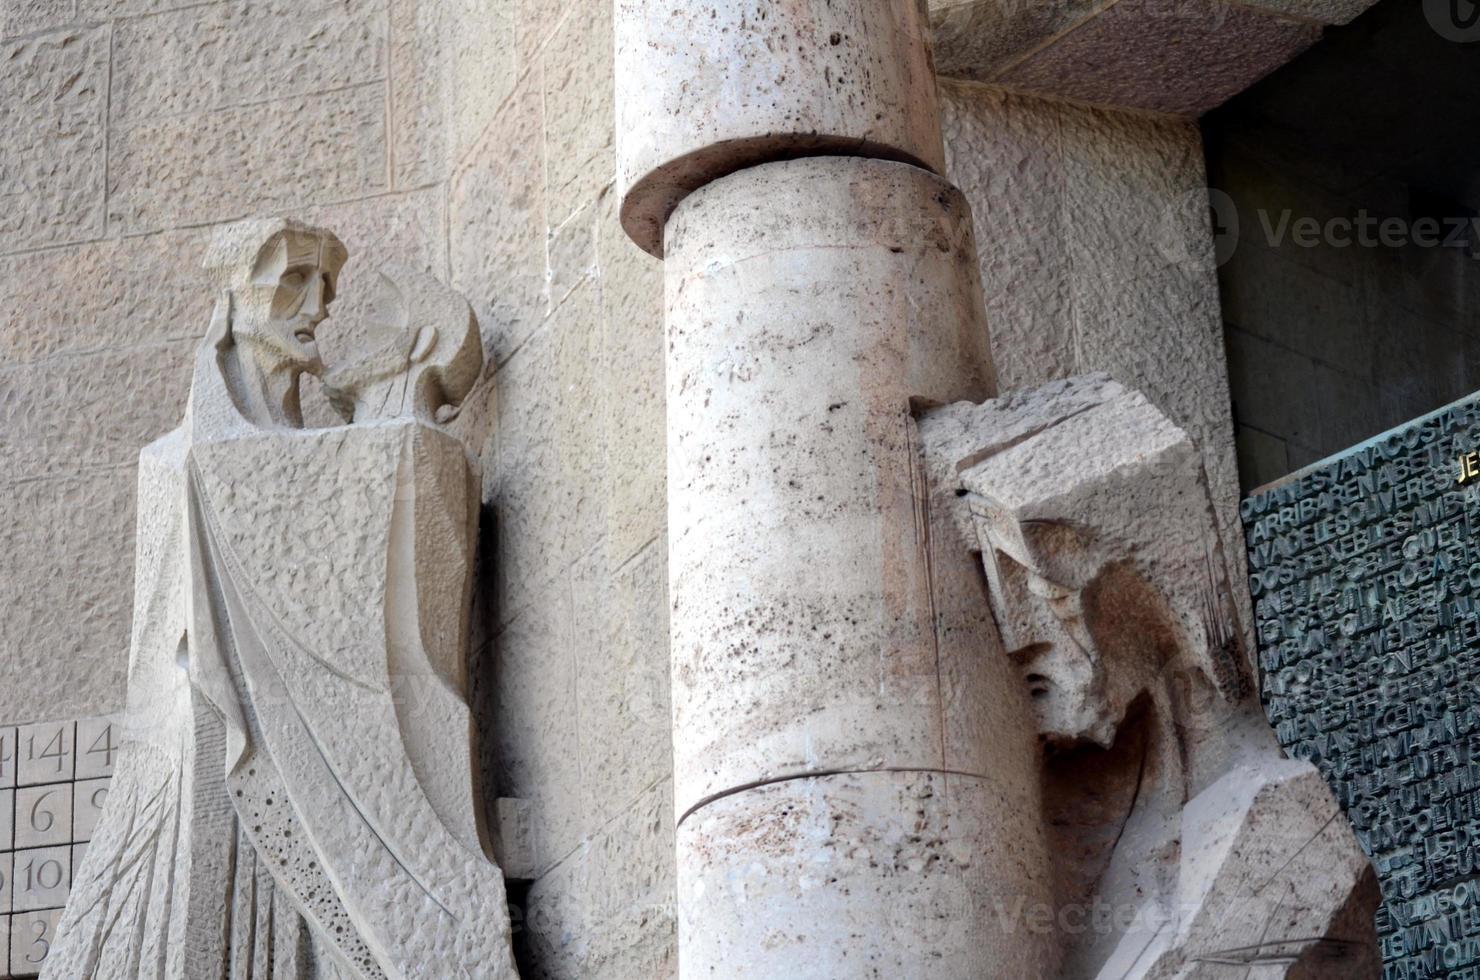 architektonische Details der Sagrada Familia Barcelona foto